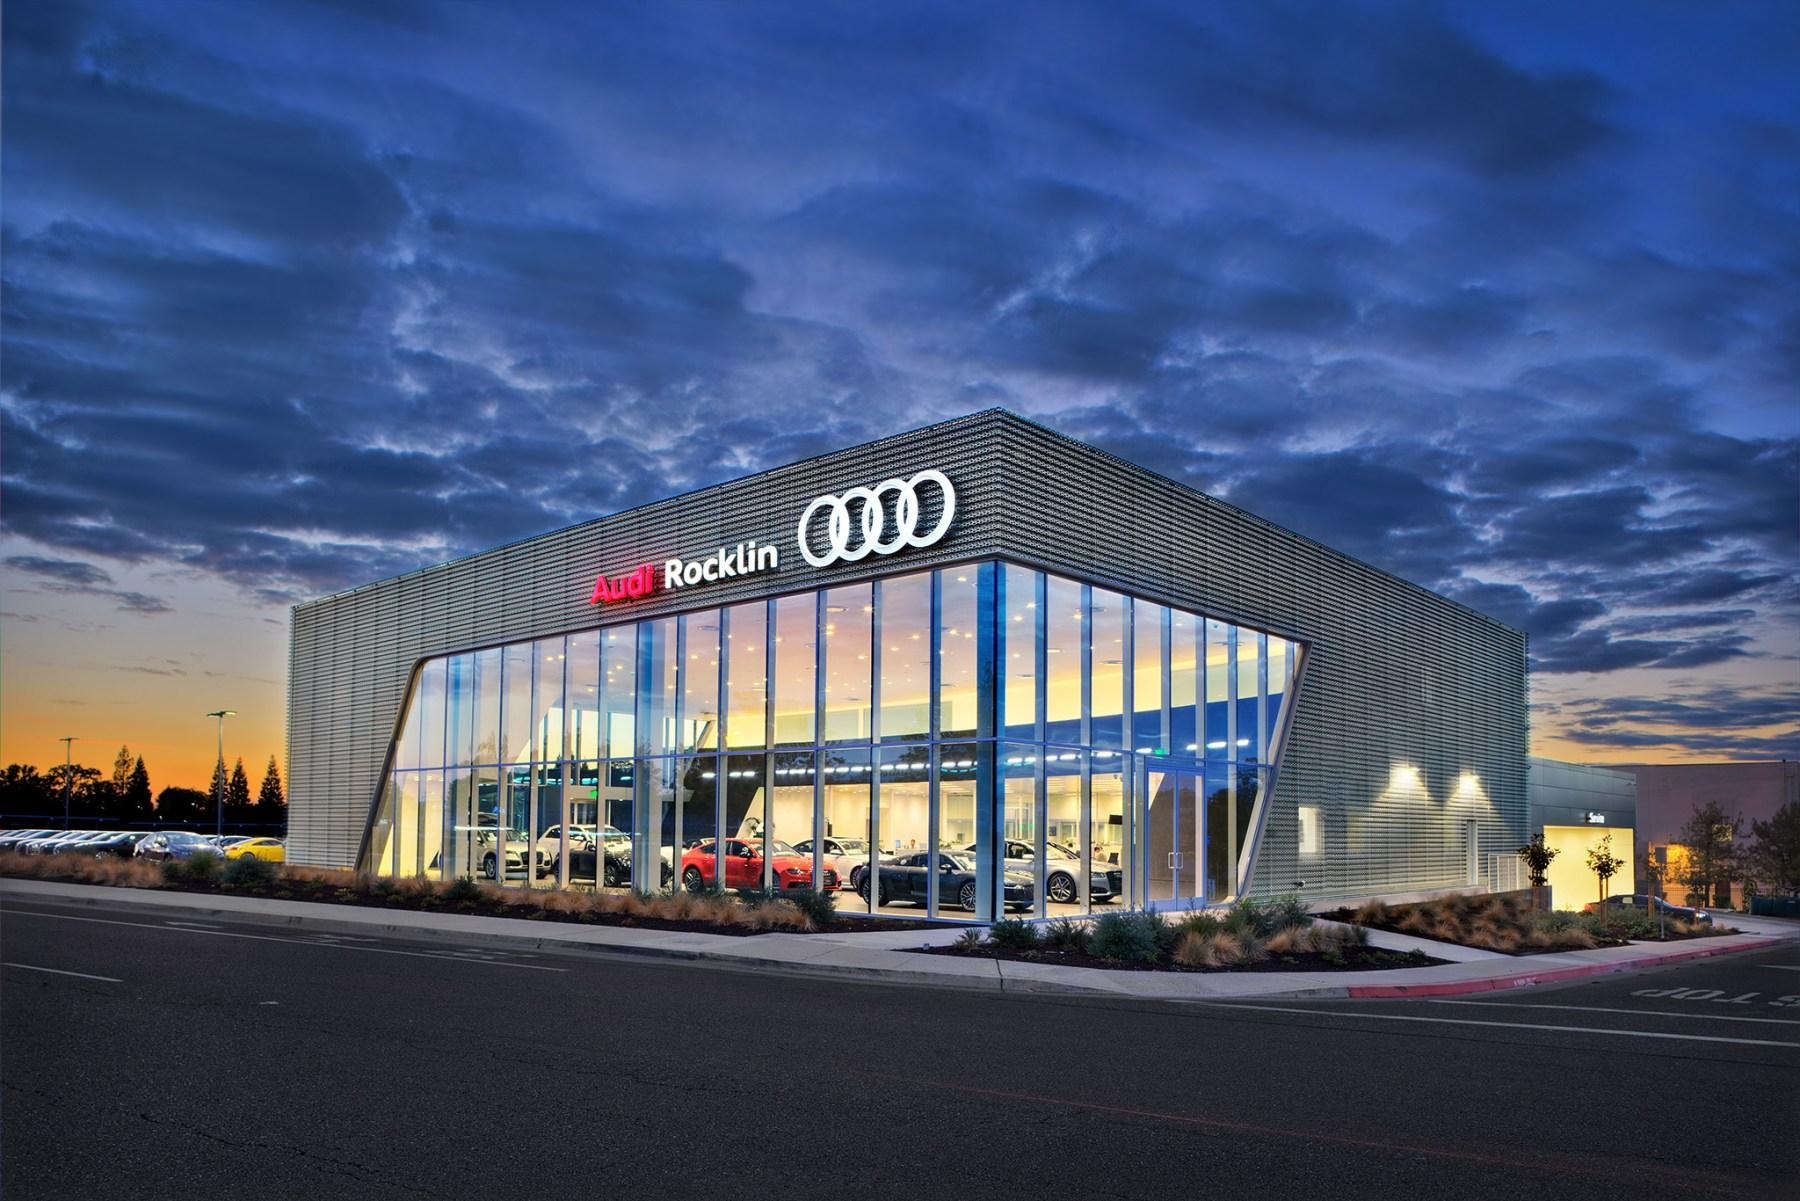 Photo of Audi Rocklin at Dusk